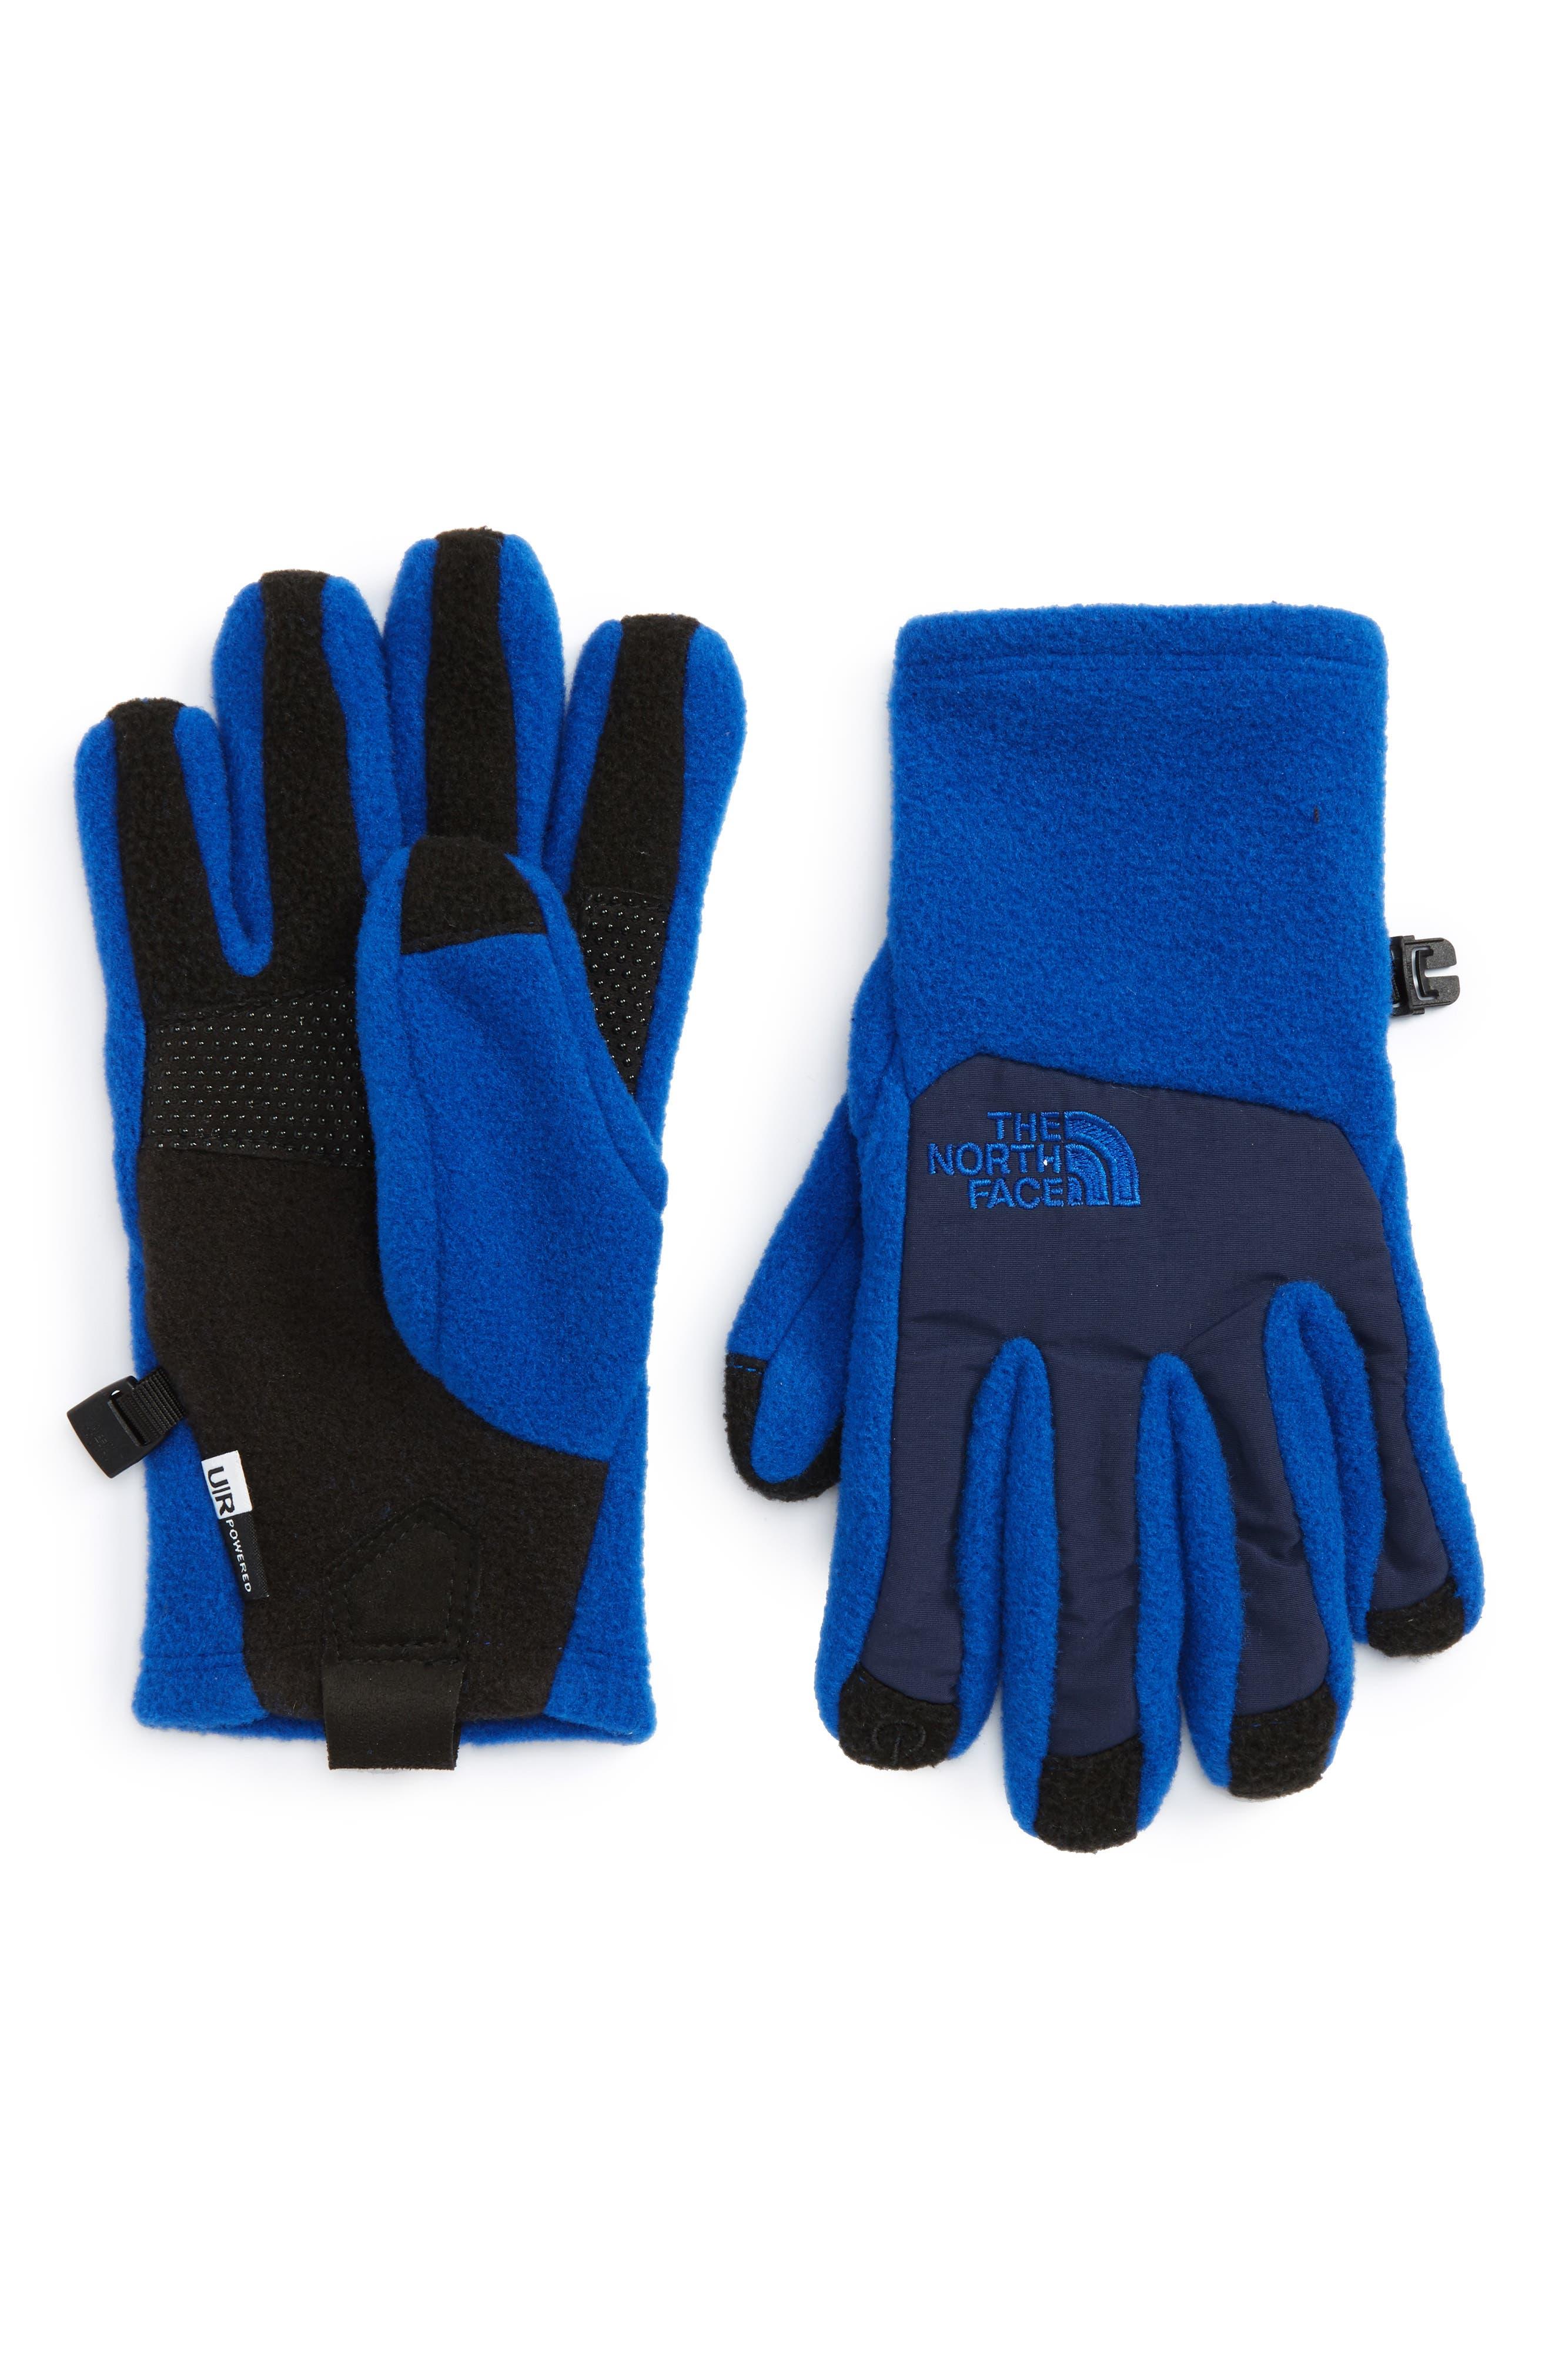 Denali Etip Gloves,                             Main thumbnail 1, color,                             401